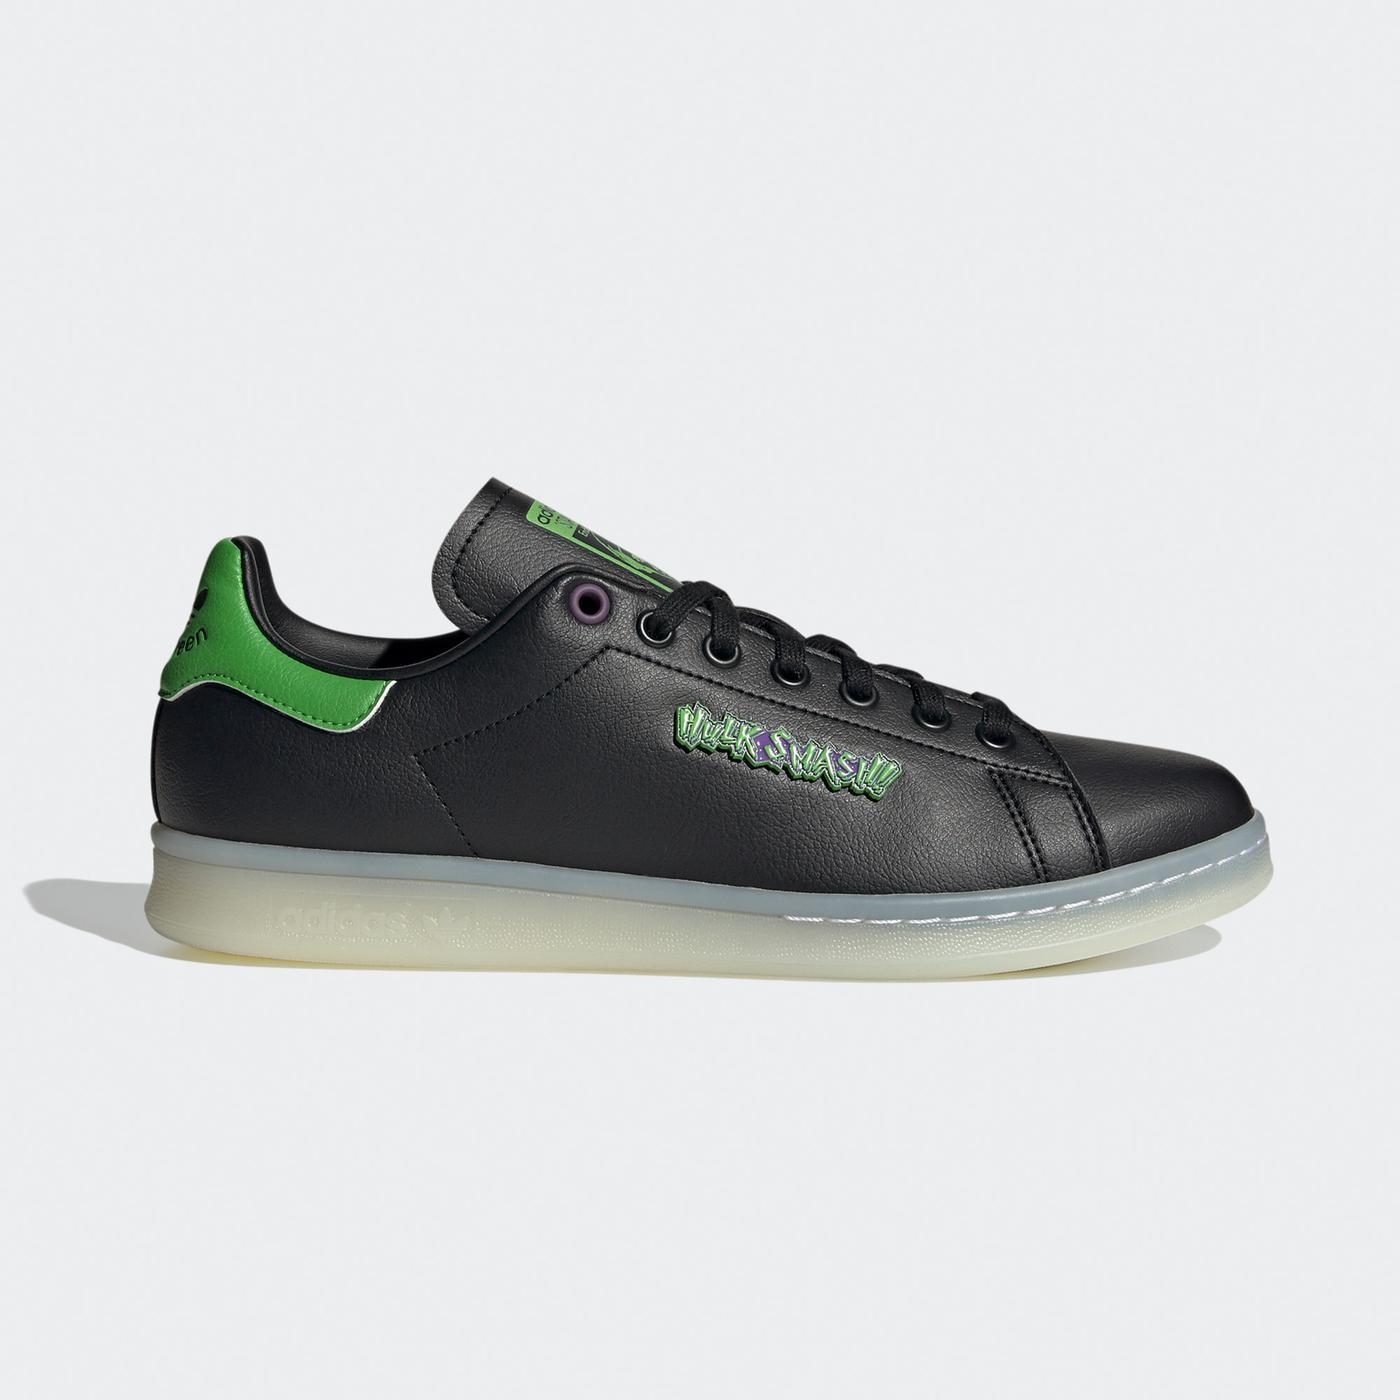 adidas Stan Smith Kadın Siyah Spor Ayakkabı